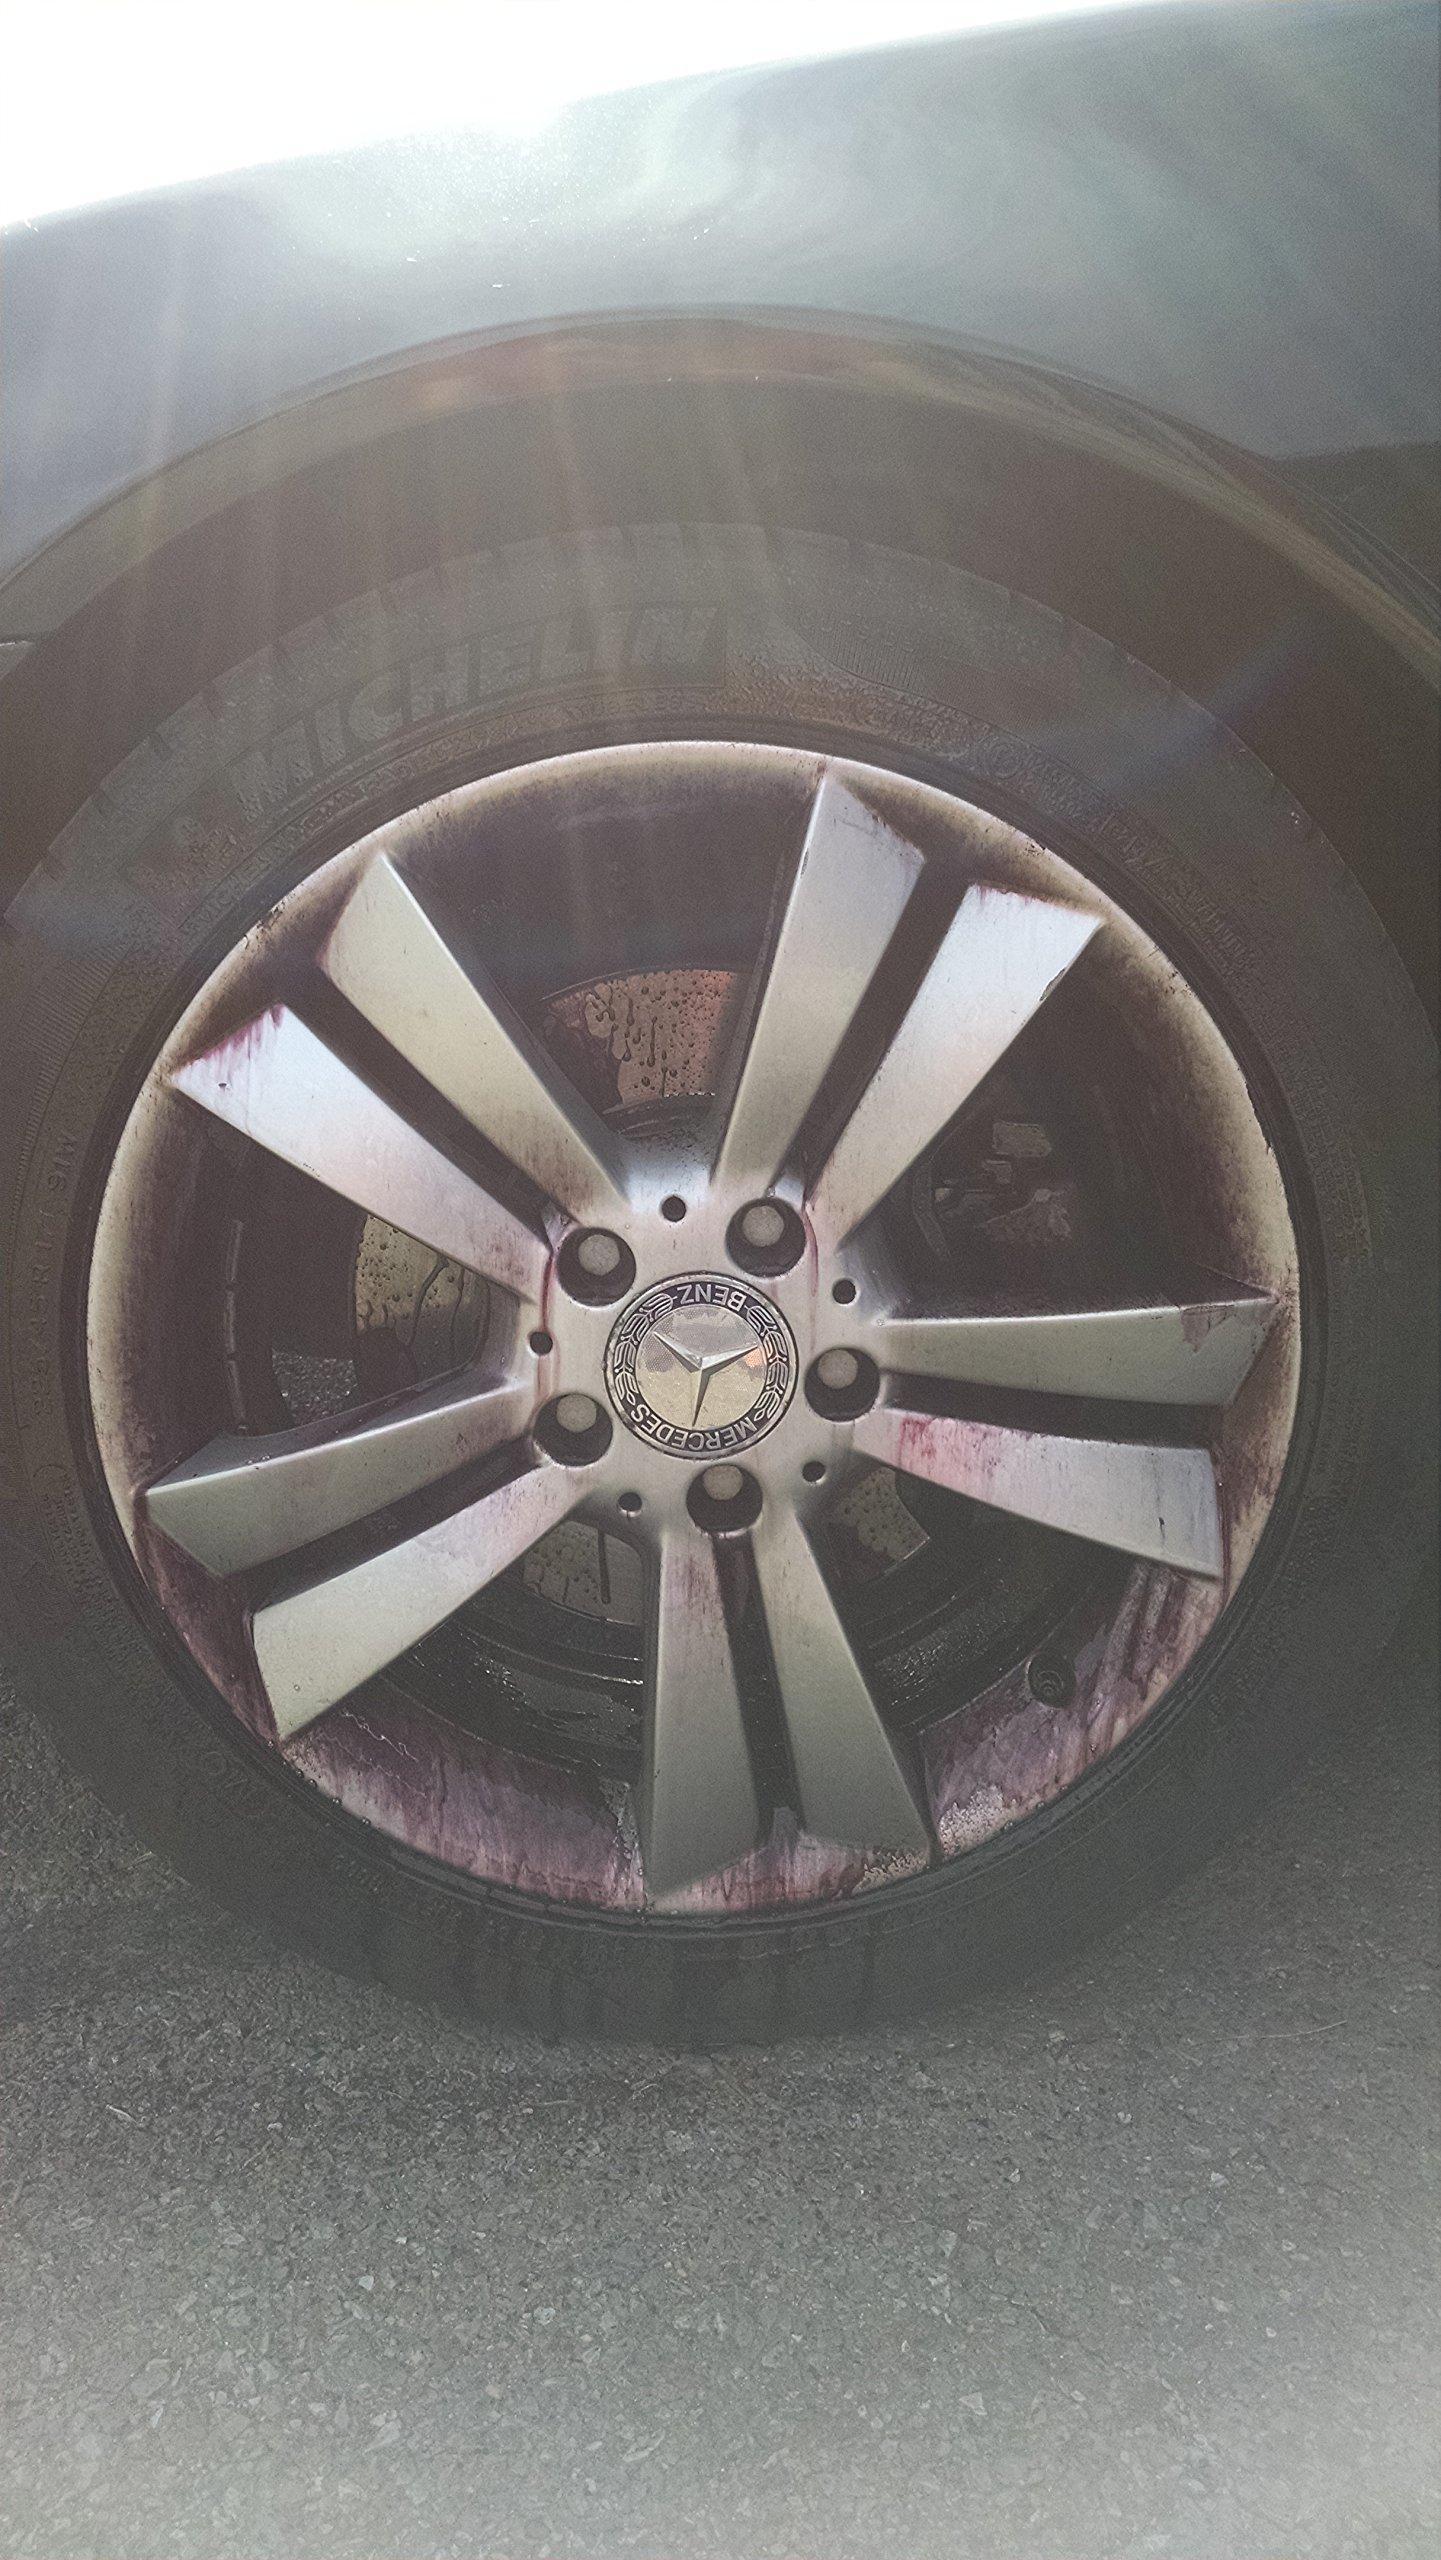 Sonax (230505) Wheel Cleaner Plus - 169.1 fl. oz. by Sonax (Image #2)